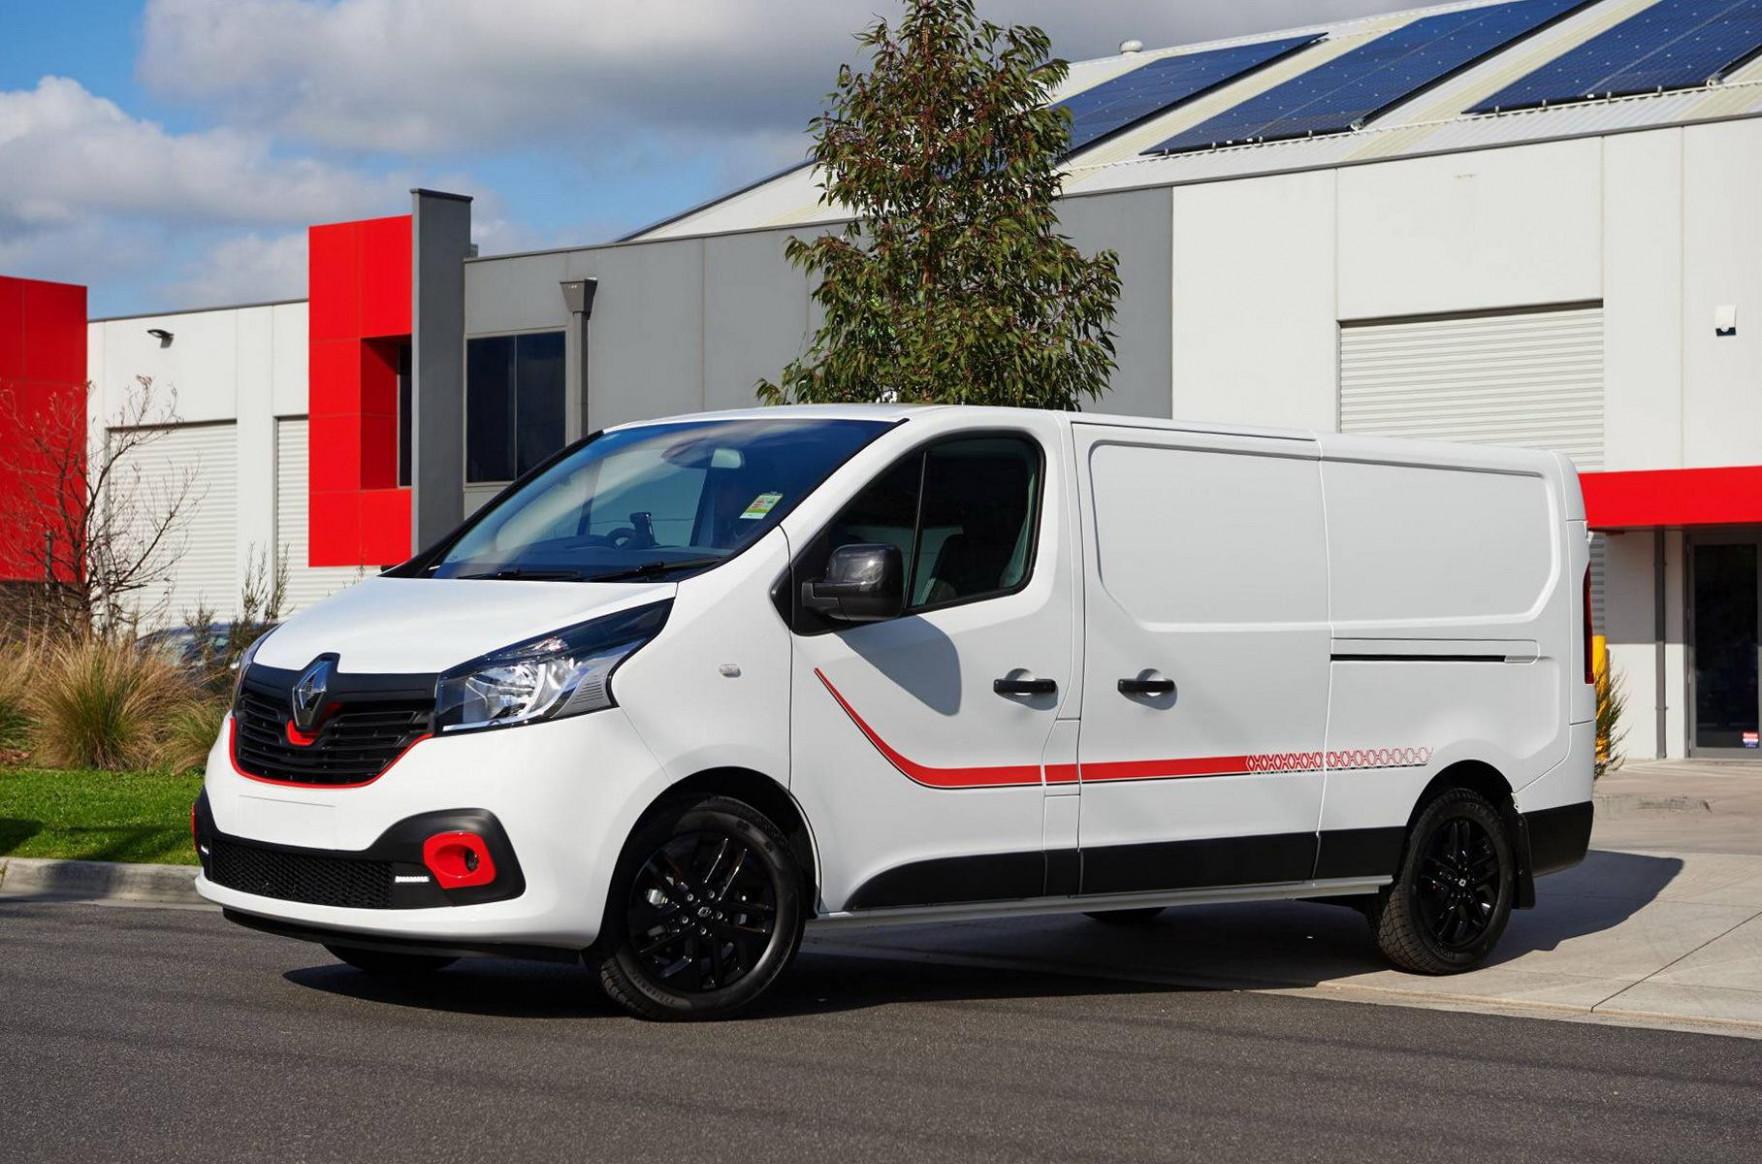 Rumors 2022 Renault Trafic